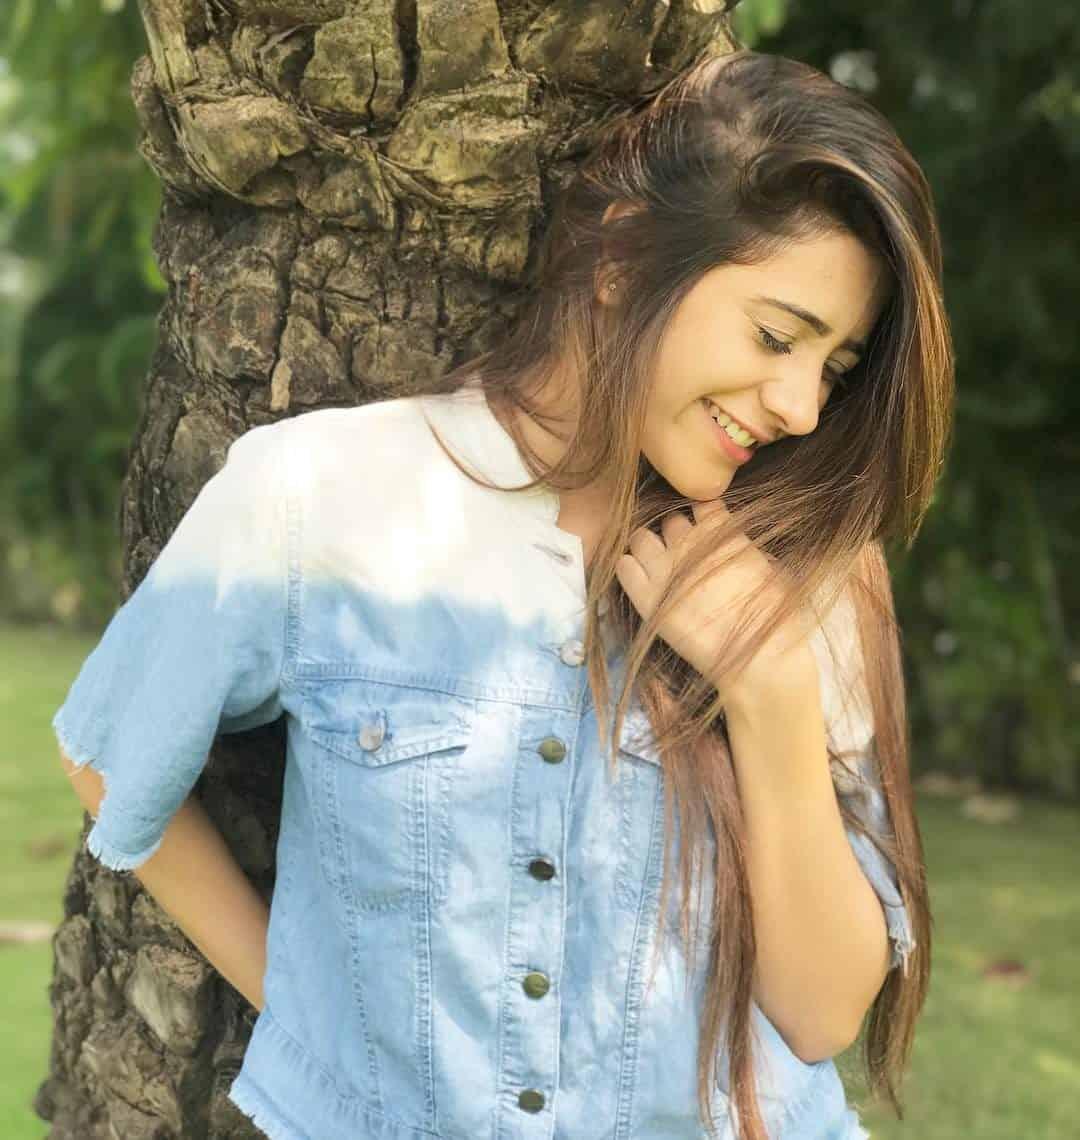 Hiba Nawab Image(photos), Biography, Age, Birthday, Husband, About, Family, Education, Net Worth, Father, Hairstyle, Awards, Instagram, Facebook, Twitter, Wiki, Youtube, Imdb (68)